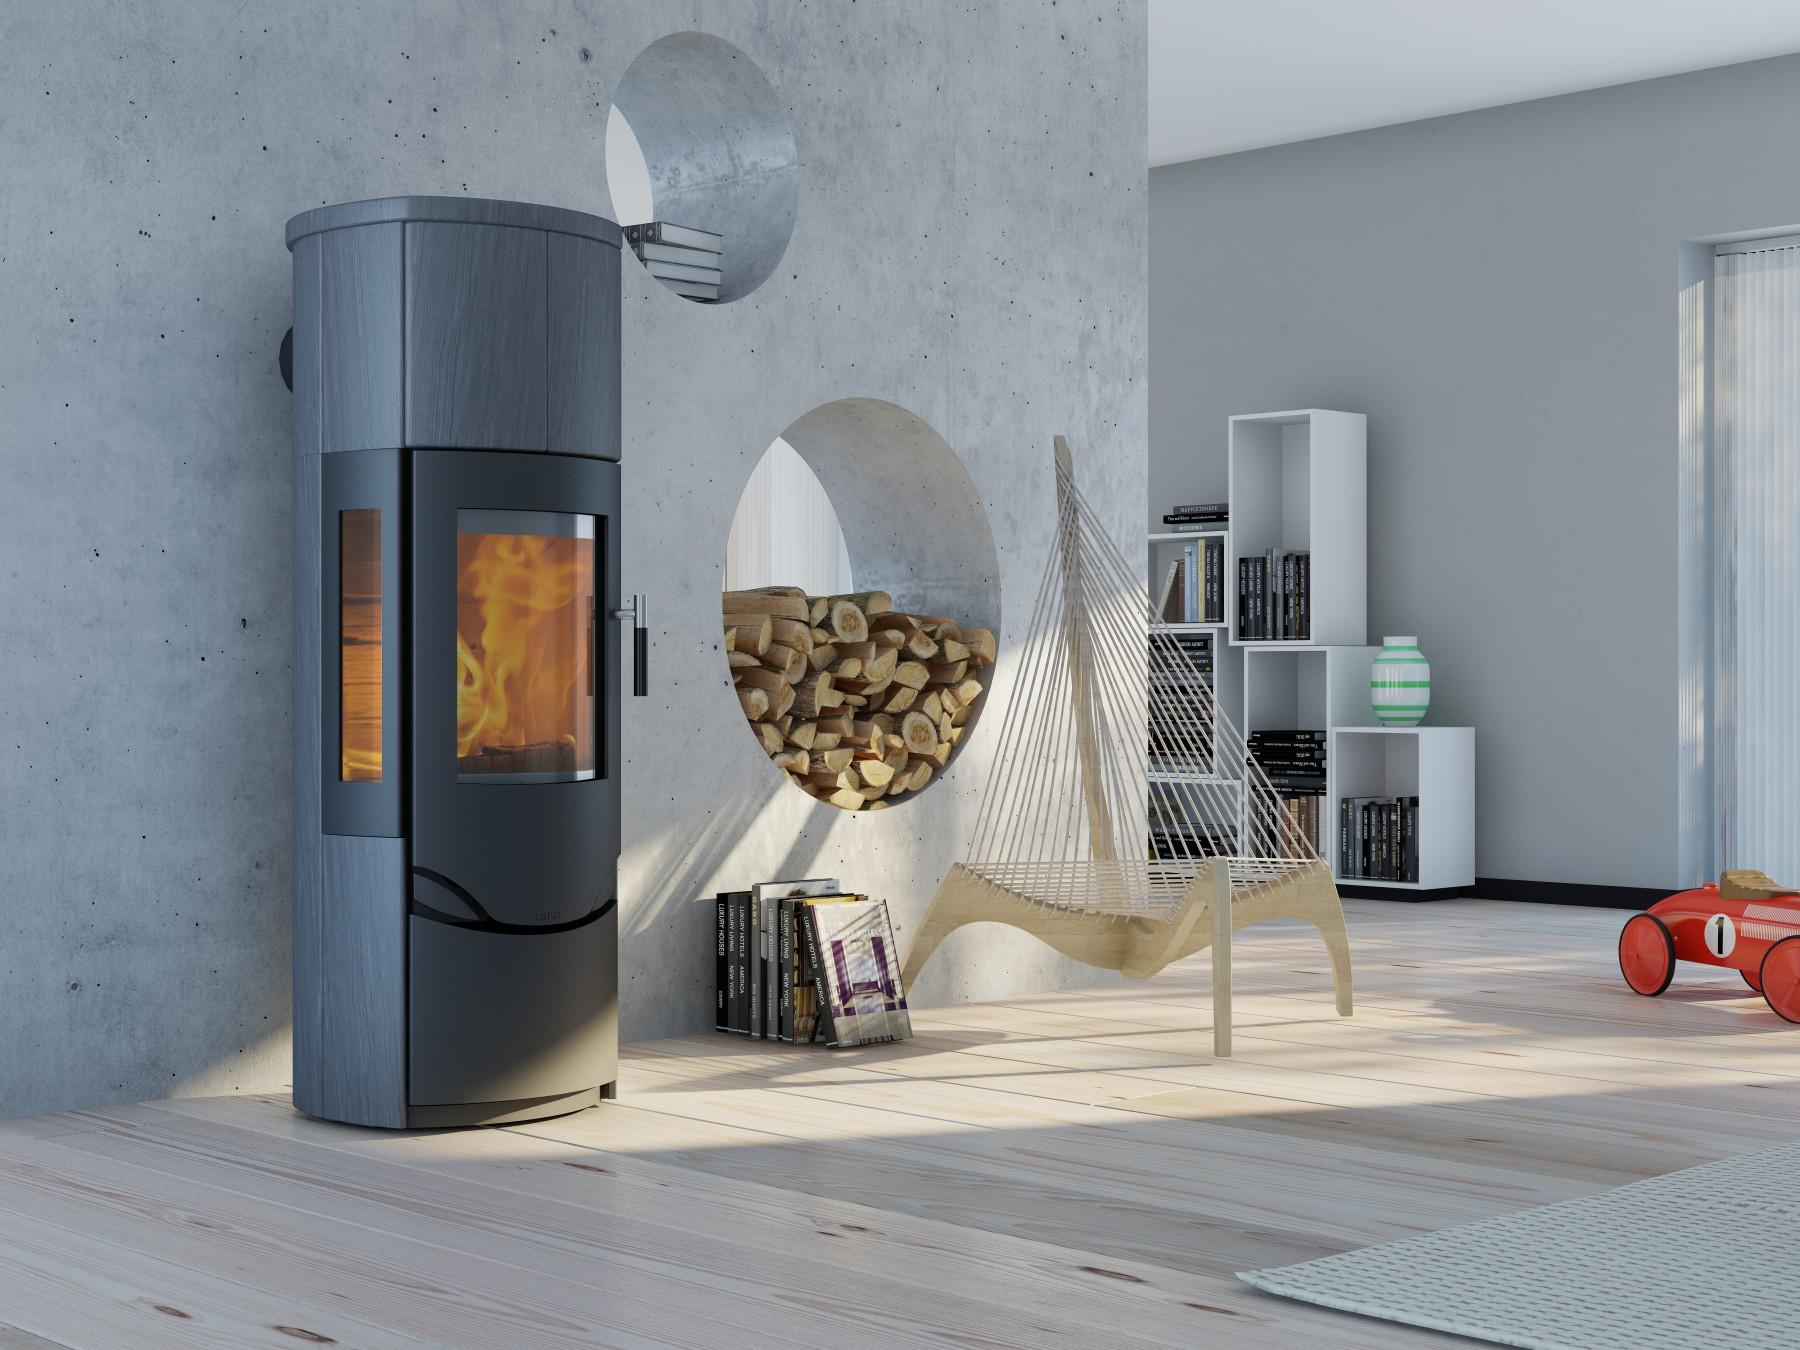 lotus prio 7m indian night kaminofen feuerland kiel. Black Bedroom Furniture Sets. Home Design Ideas